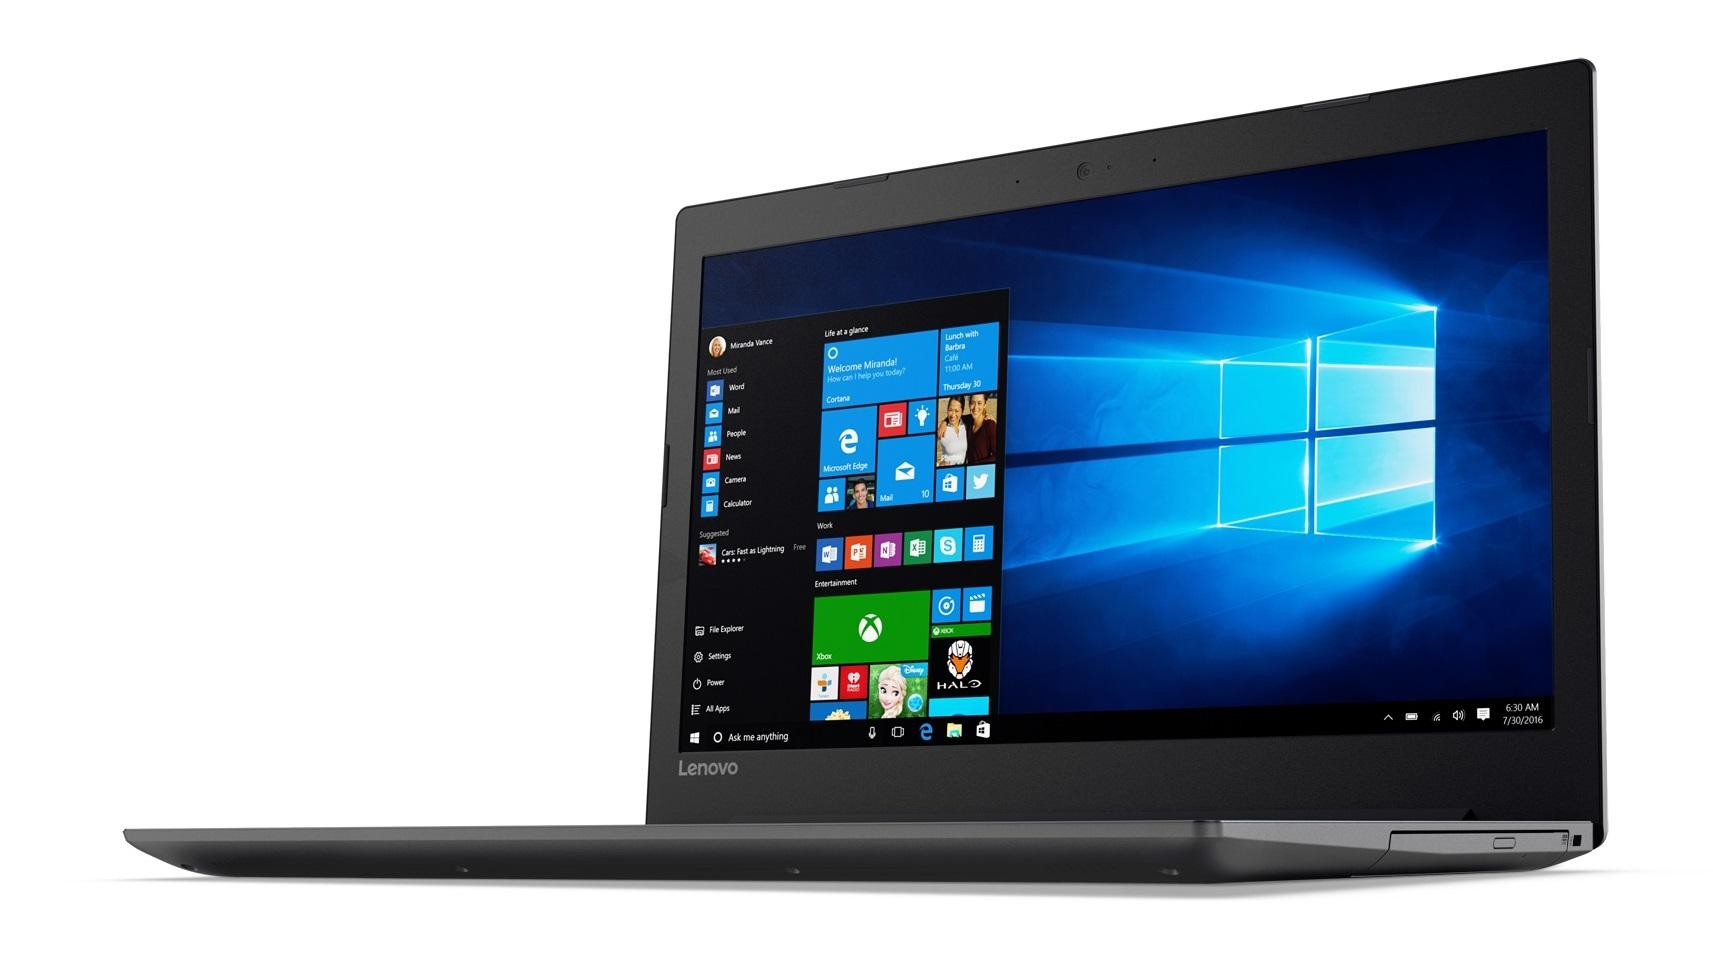 Фото  Ноутбук Lenovo ideapad 320-15IKB Onyx Black (80XL041URA)